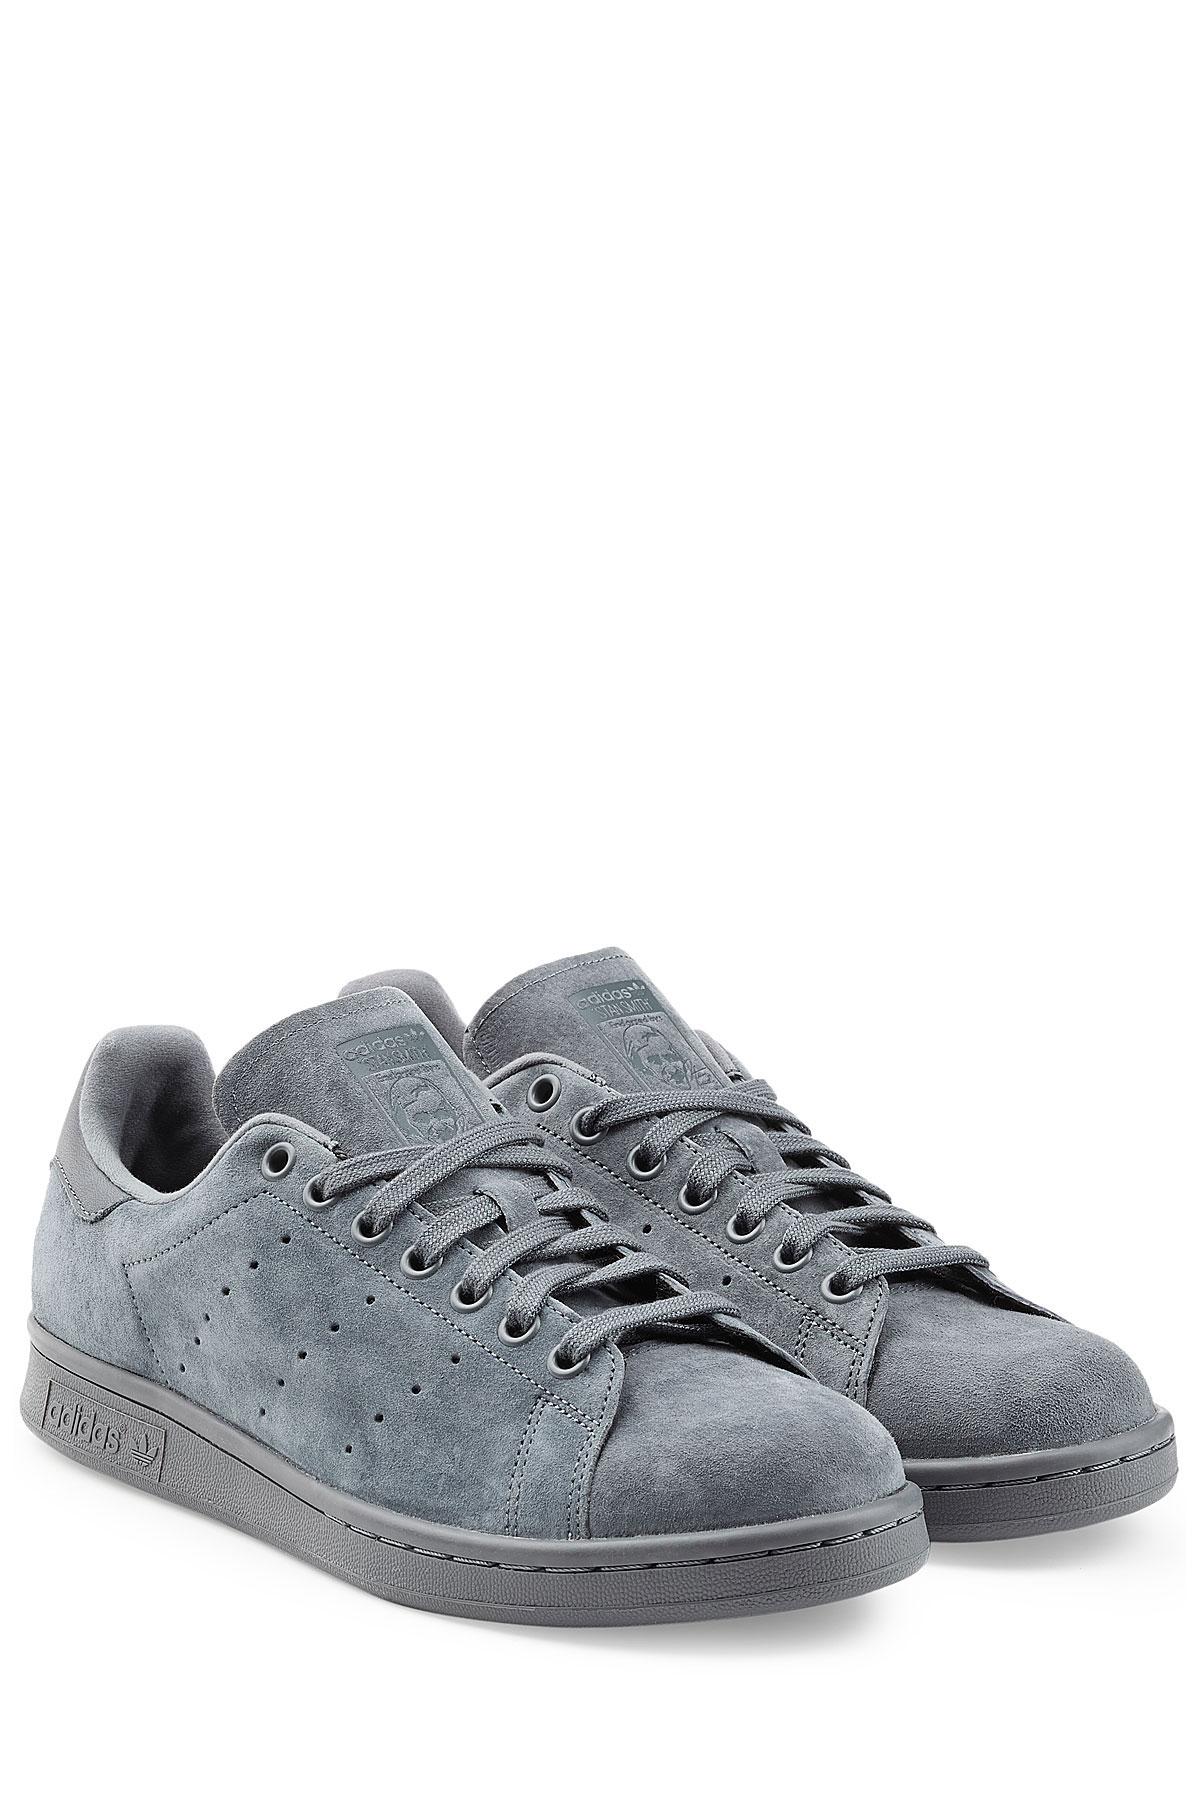 sale gris stan smith adidas suede 51980 b7ab4